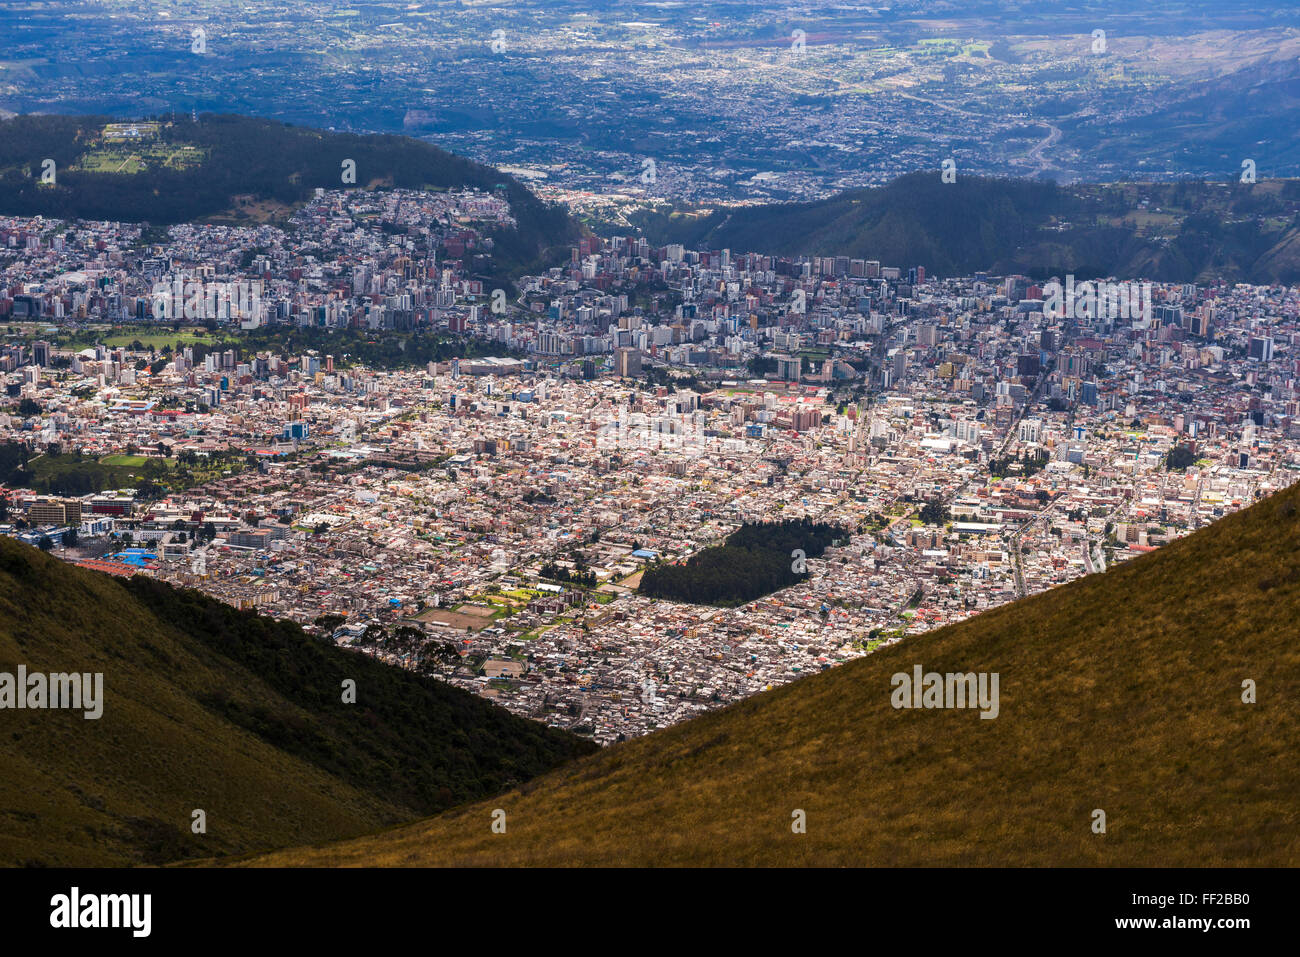 Altstadt von Quito gesehen vom Pichincha VoRMcano, Quito, Ecuador, Südamerika Stockbild